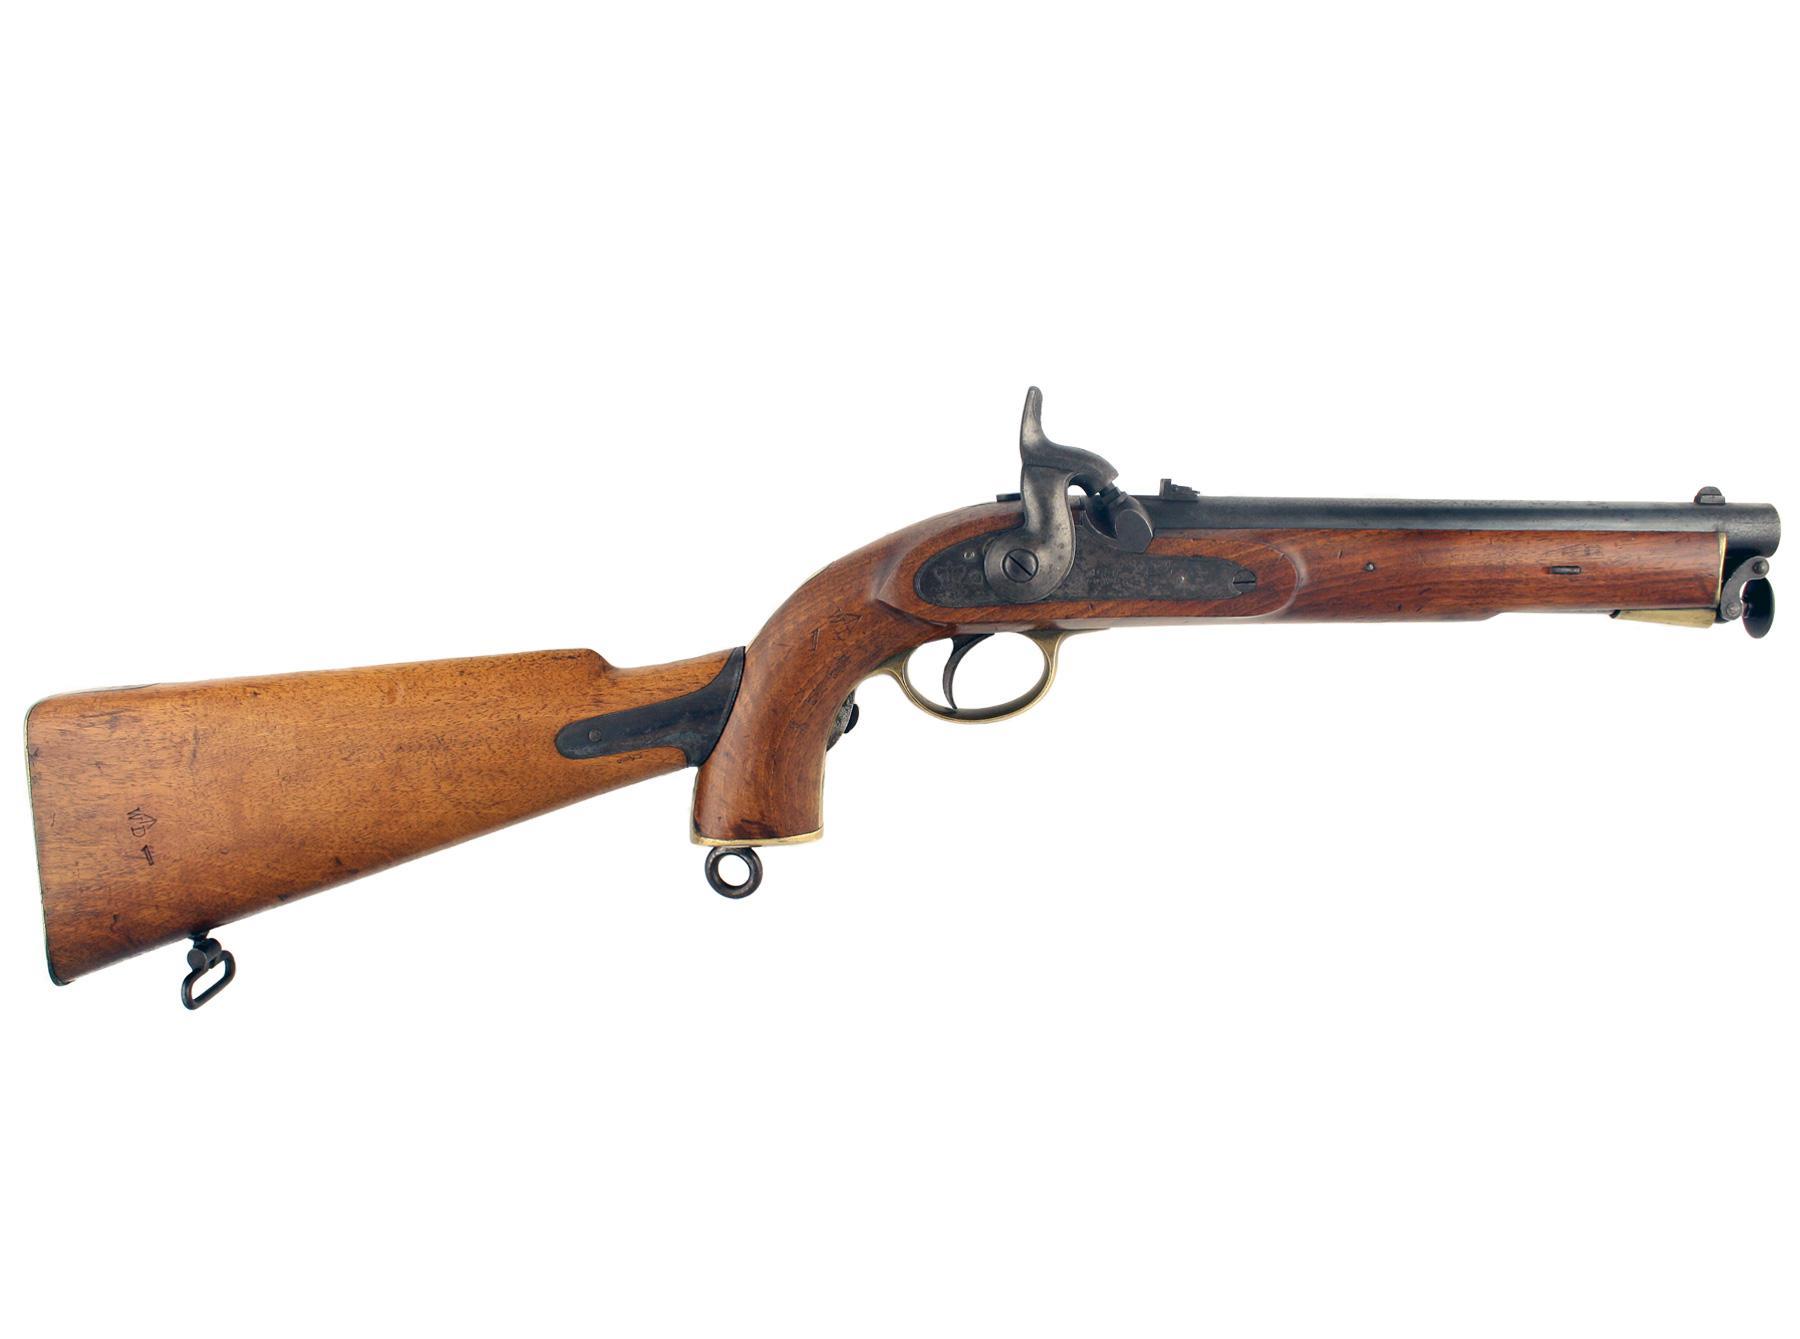 An Incredibly Rare 1856 Lancers Pistol